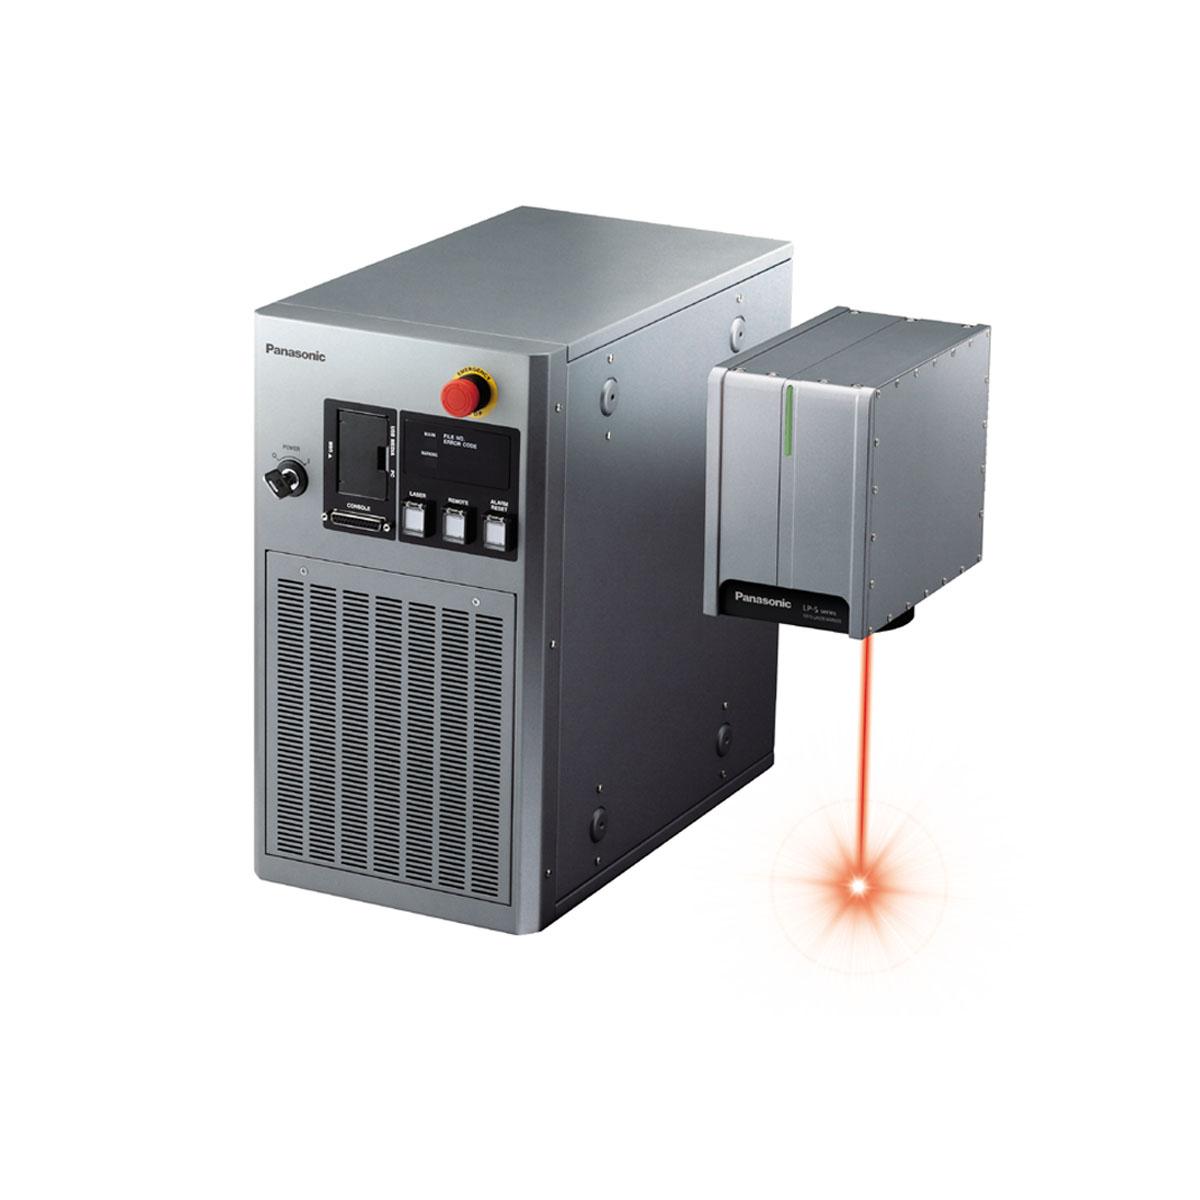 PANASONIC / SUNX LP-S SERIES เครื่องพิมพ์ตัวอักษรด้วยเลเซอร์ ชนิด FAYb Laser Marker